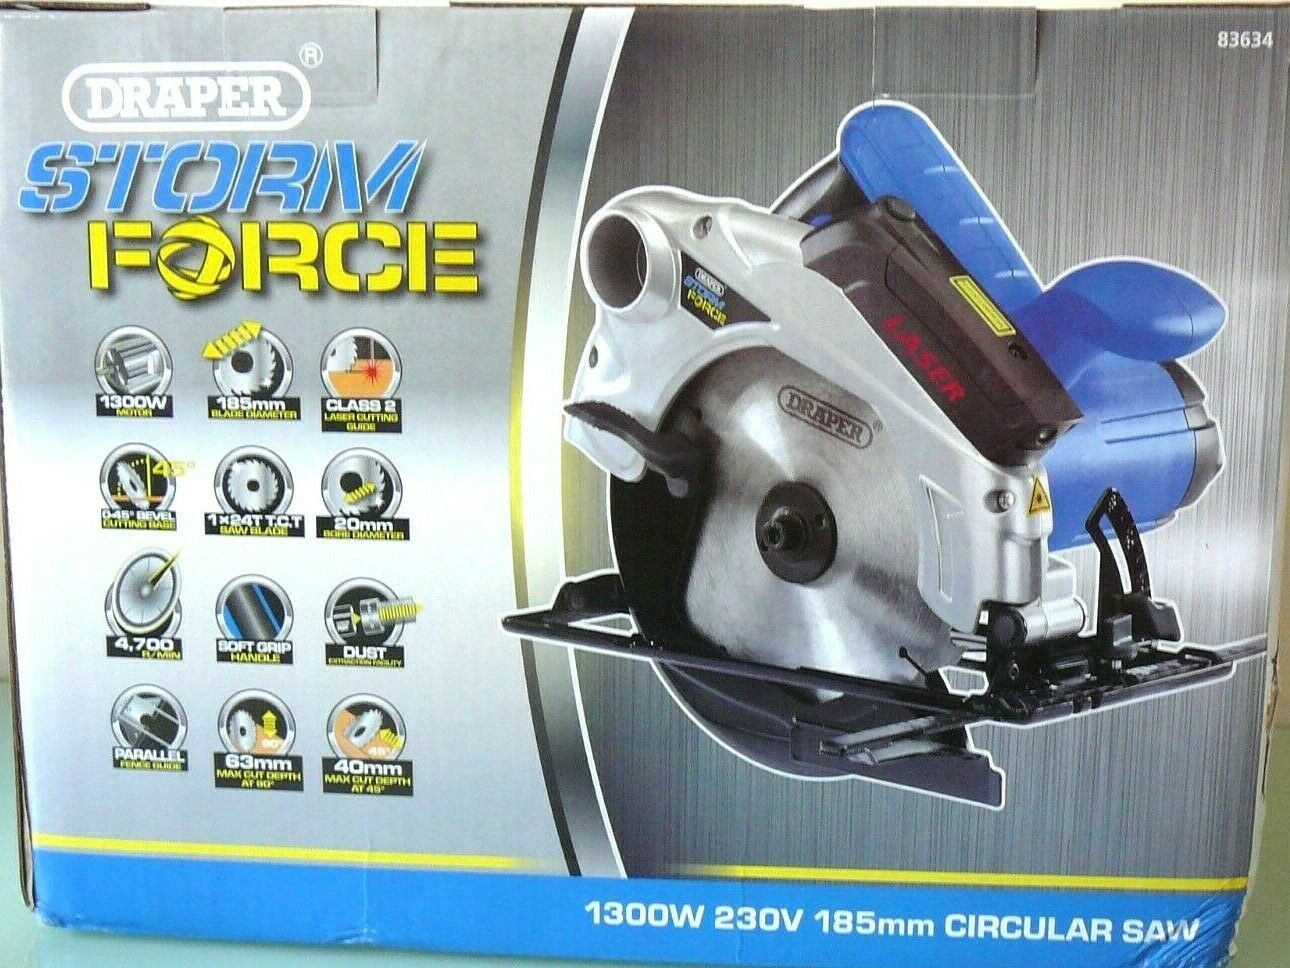 DRAPER Storm Force 185mm Circular Saw (1300W) 230V LASER CUTTING GUIDE